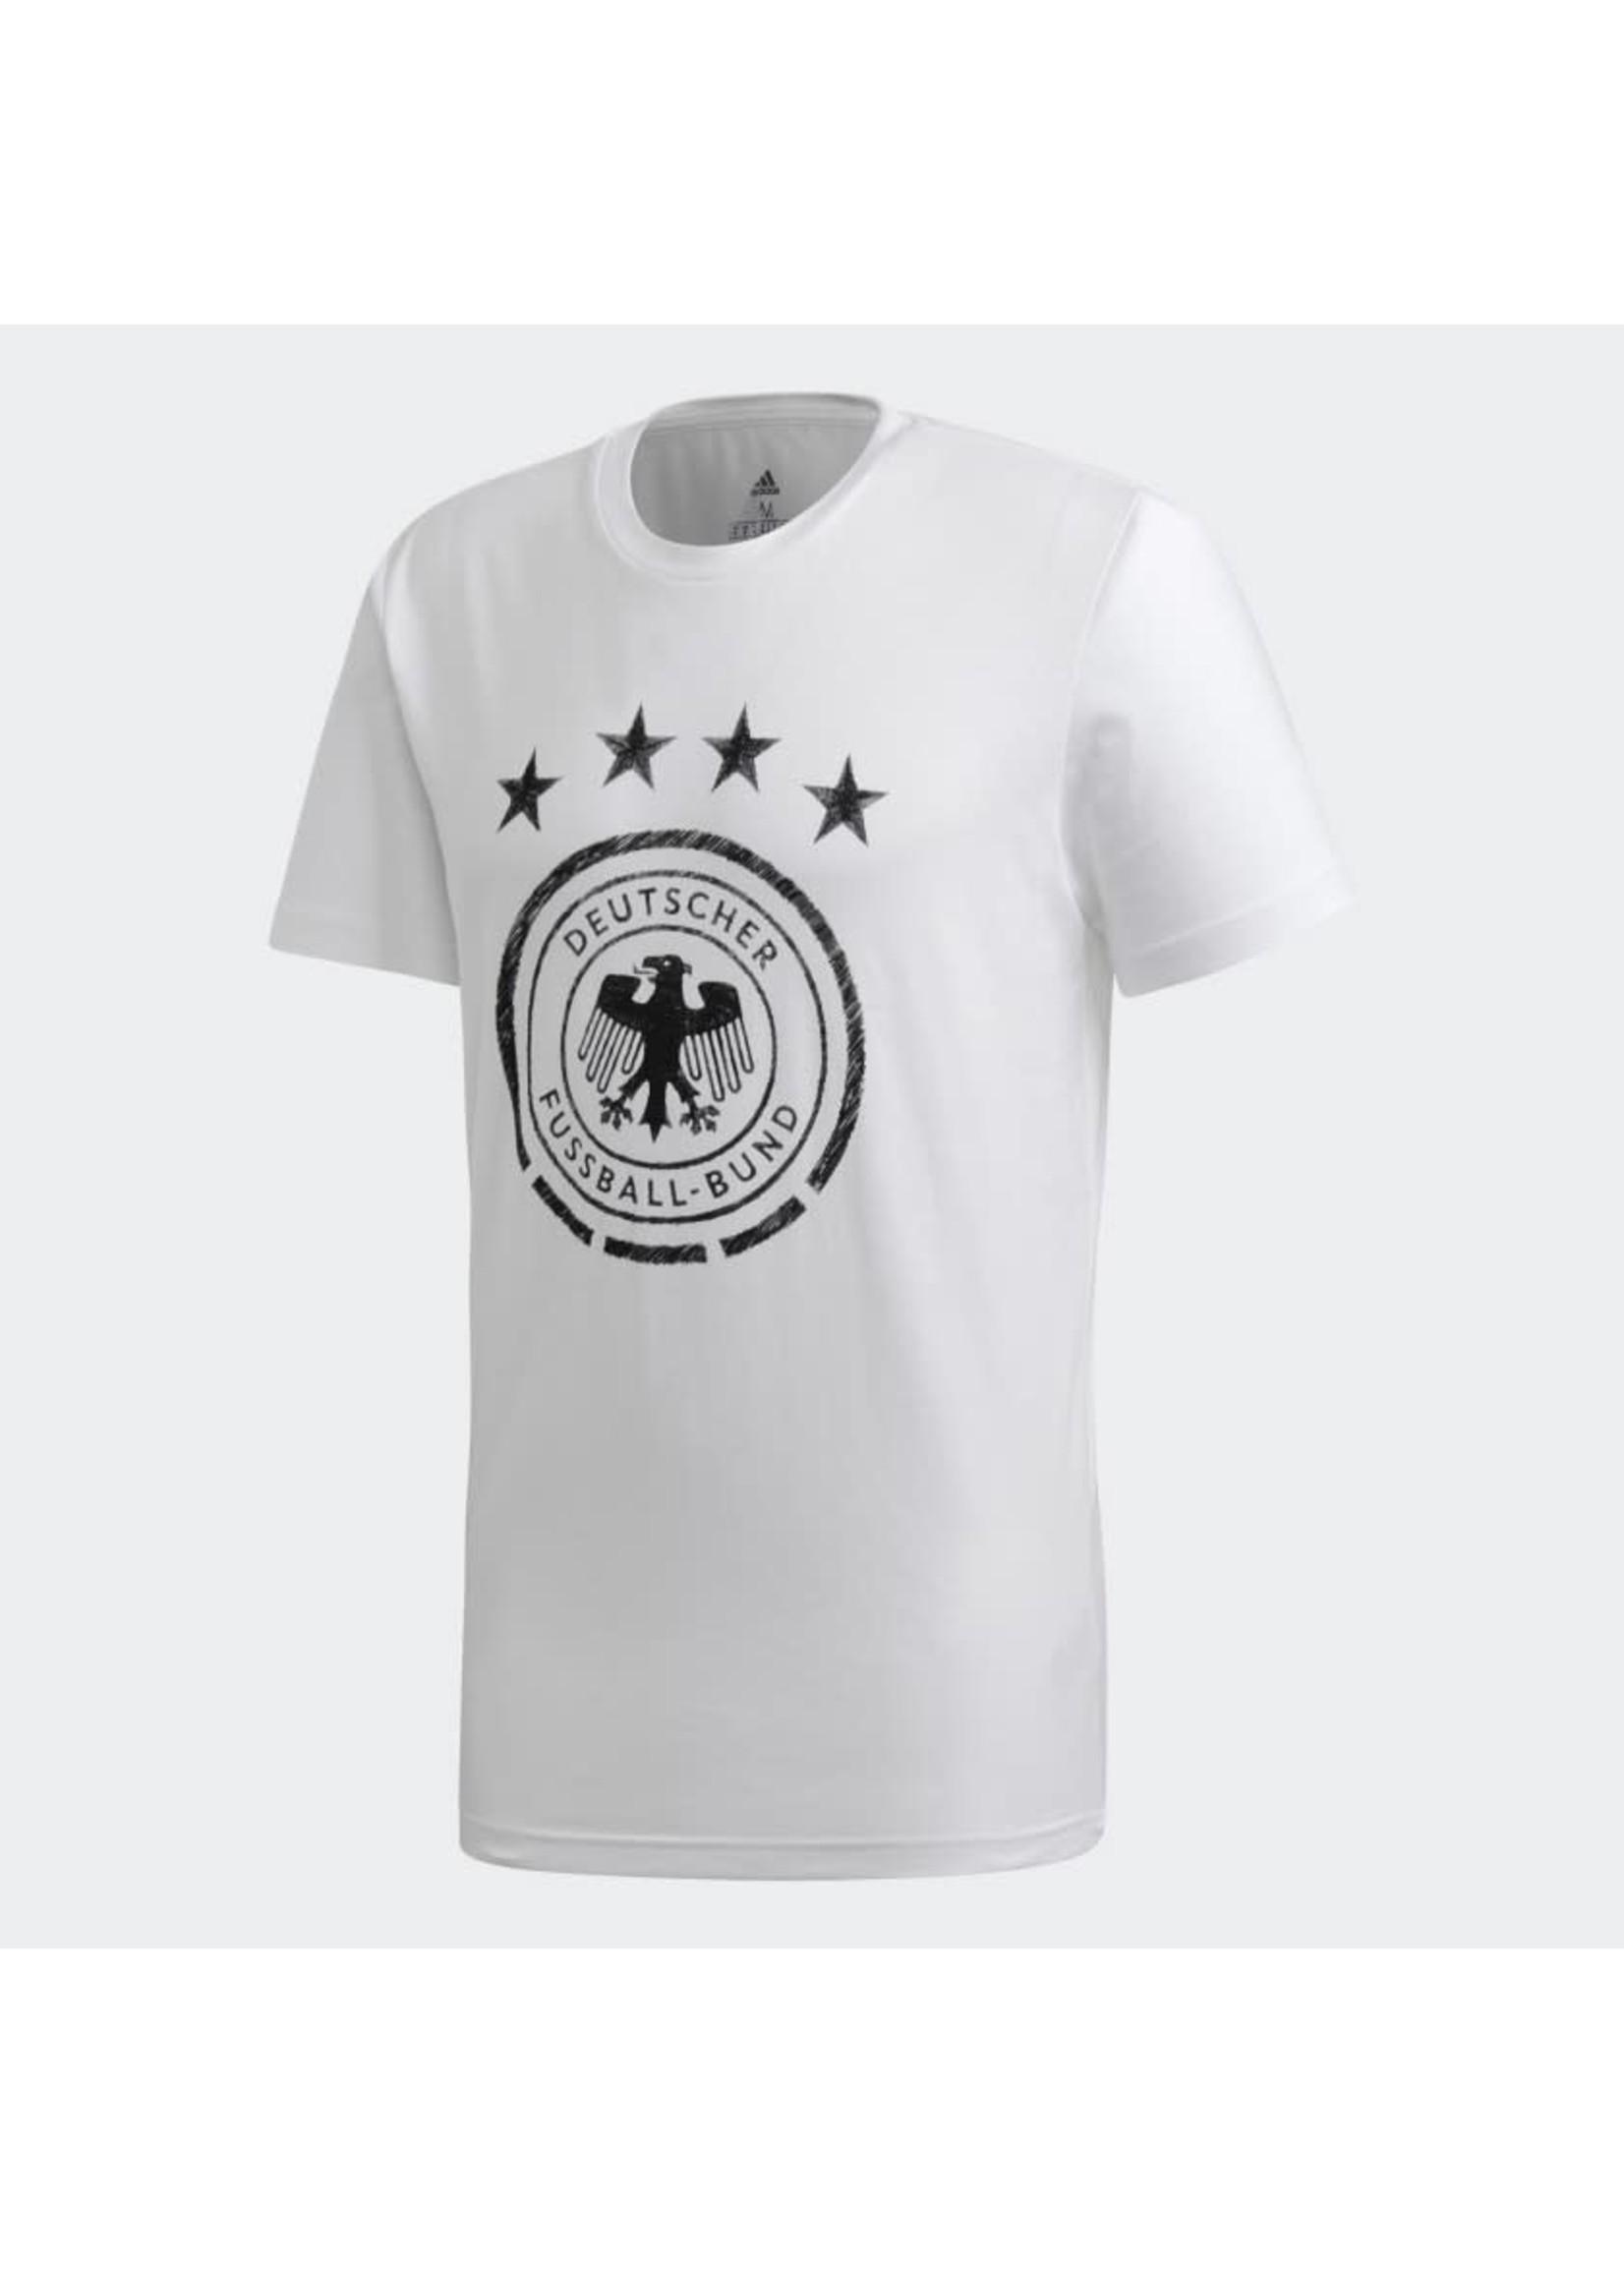 Adidas Germany T-Shirt - FI1464